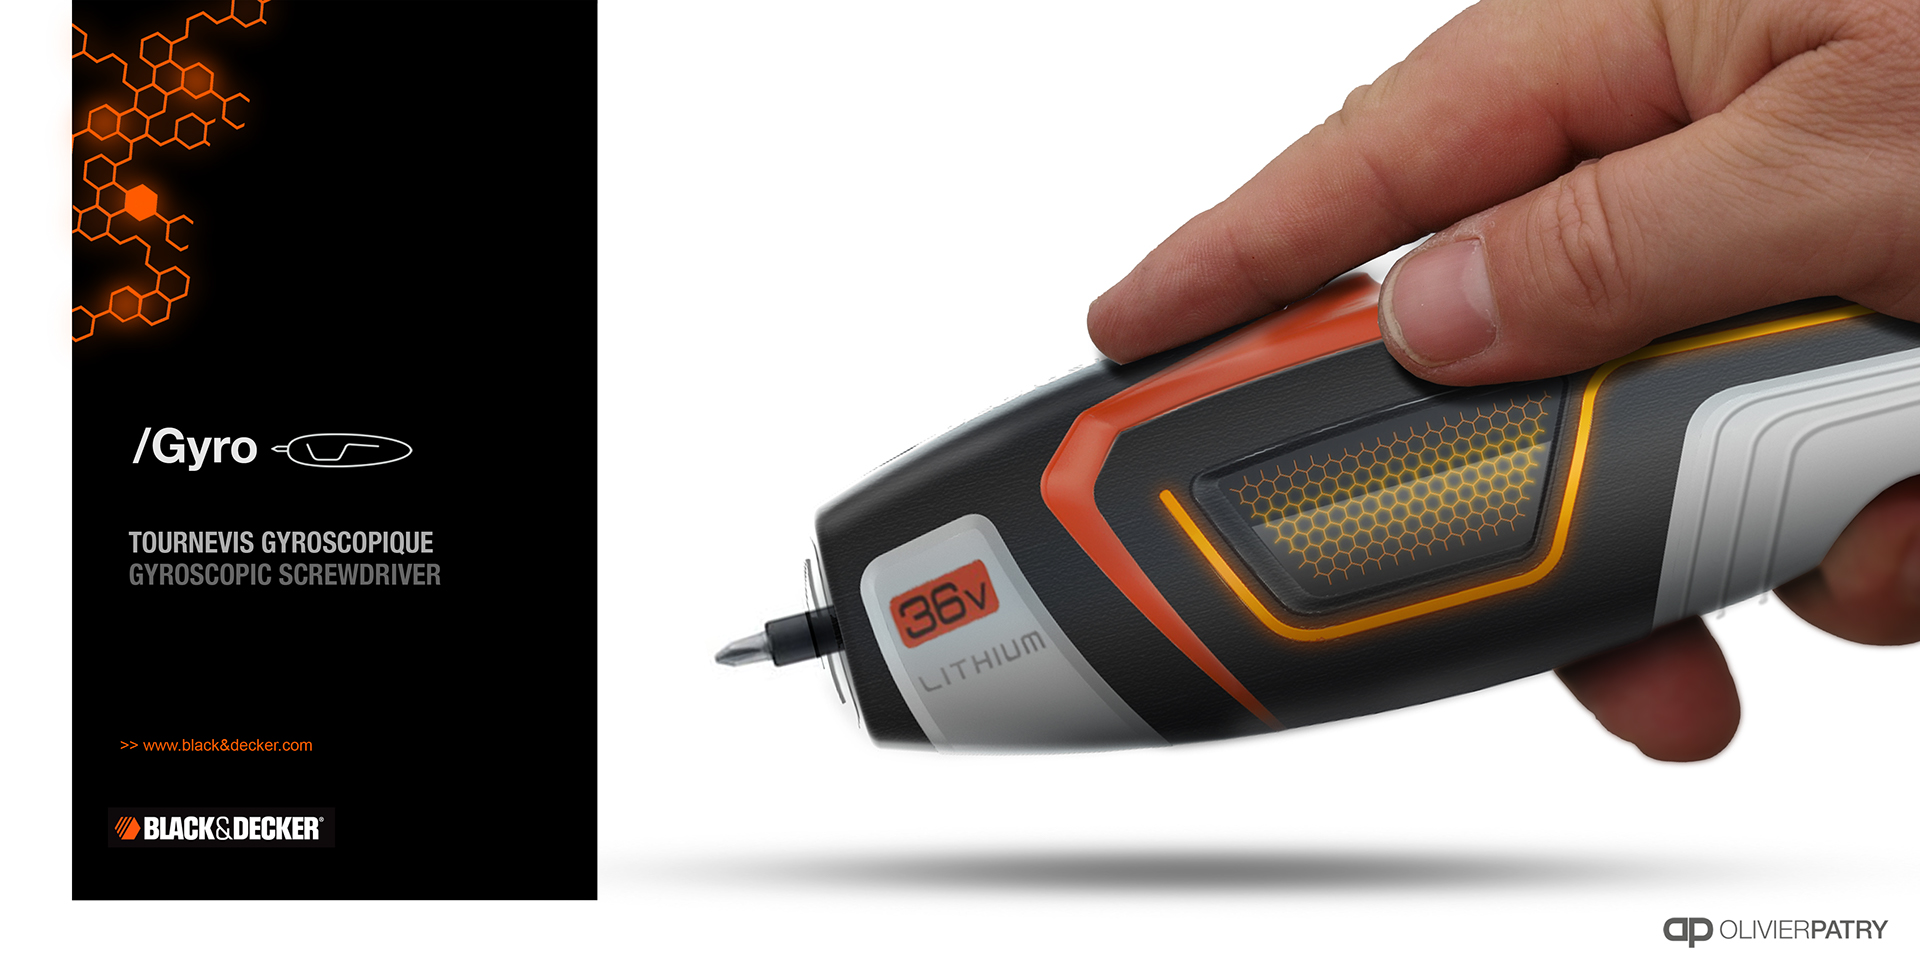 Gyro screwdriver bette steel shower tray